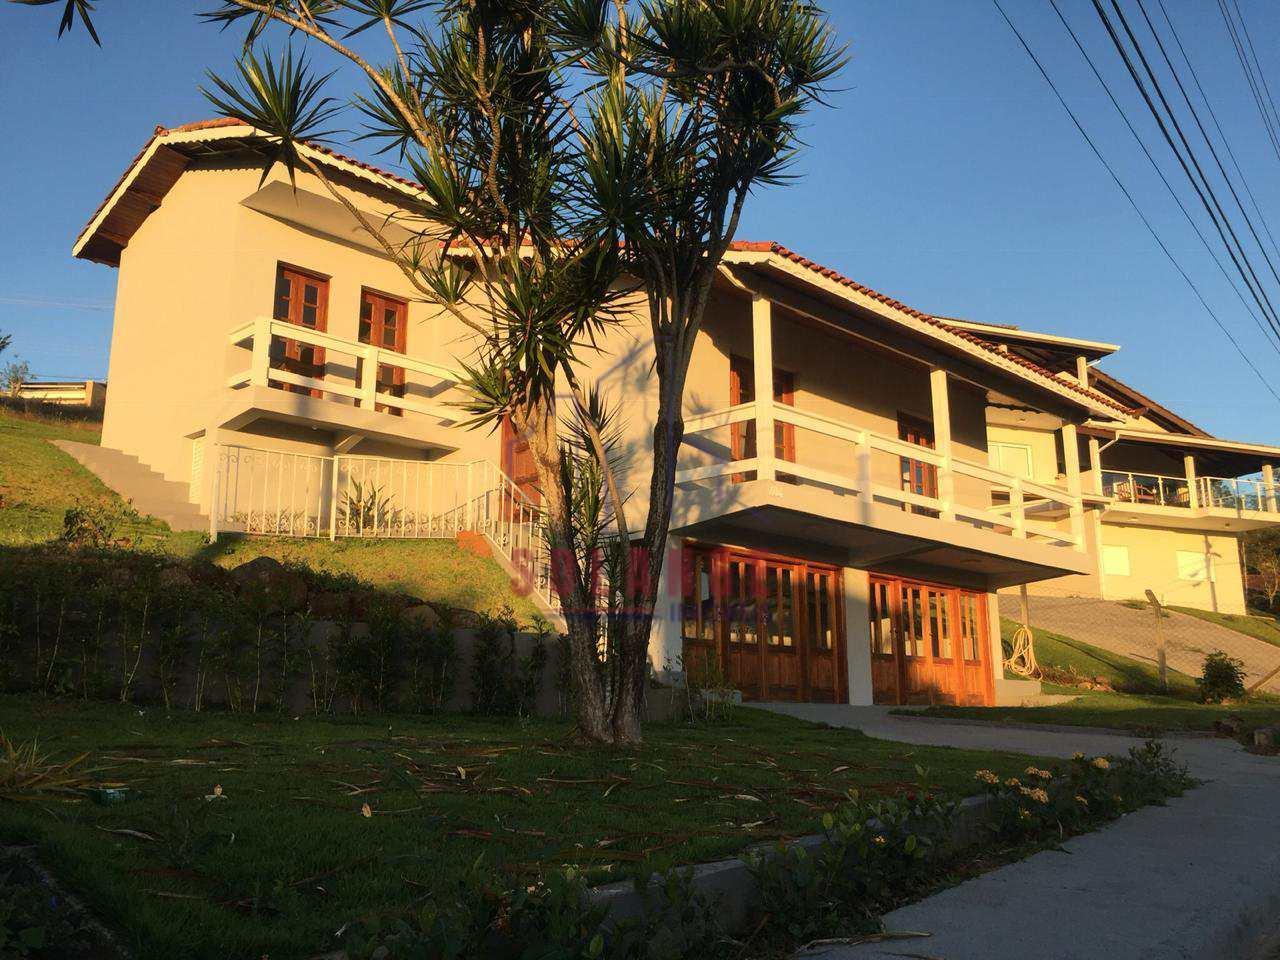 Casa de Condomínio com 1 dorm, Orypaba, Monte Alegre do Sul, Cod: 2071